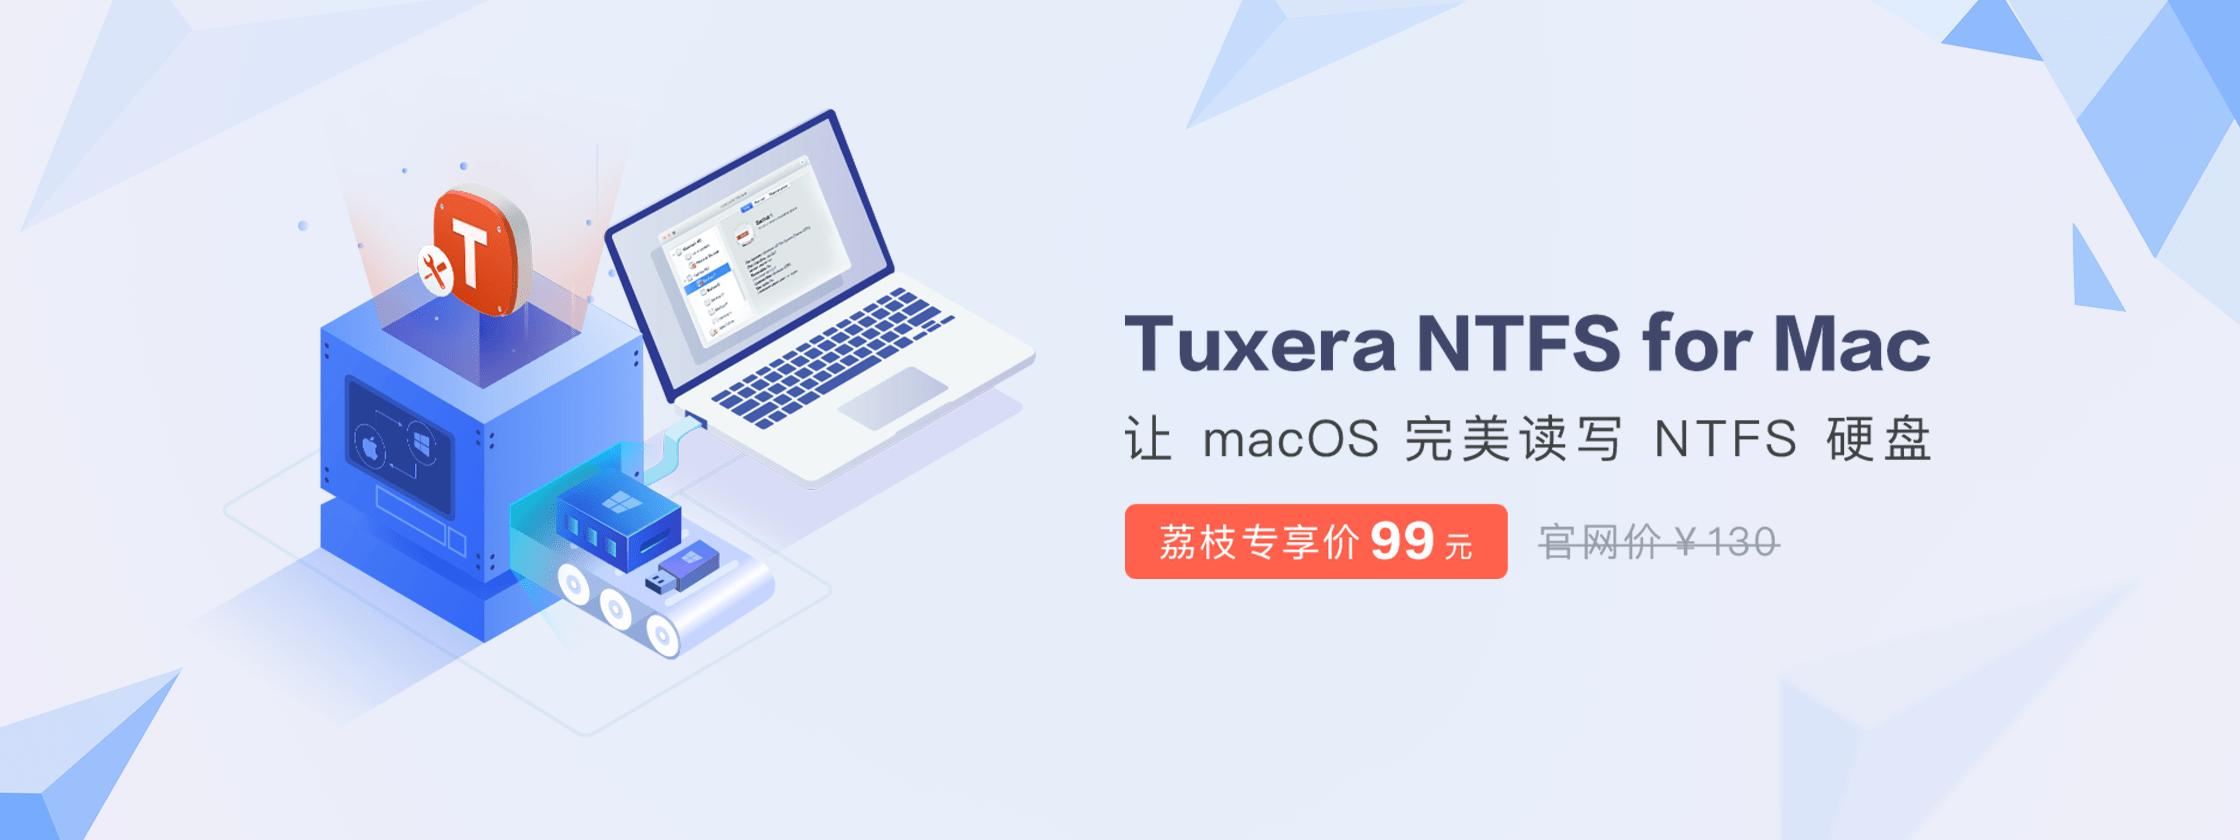 Tuxera NTFS:让 macOS 完美读写 NTFS 硬盘